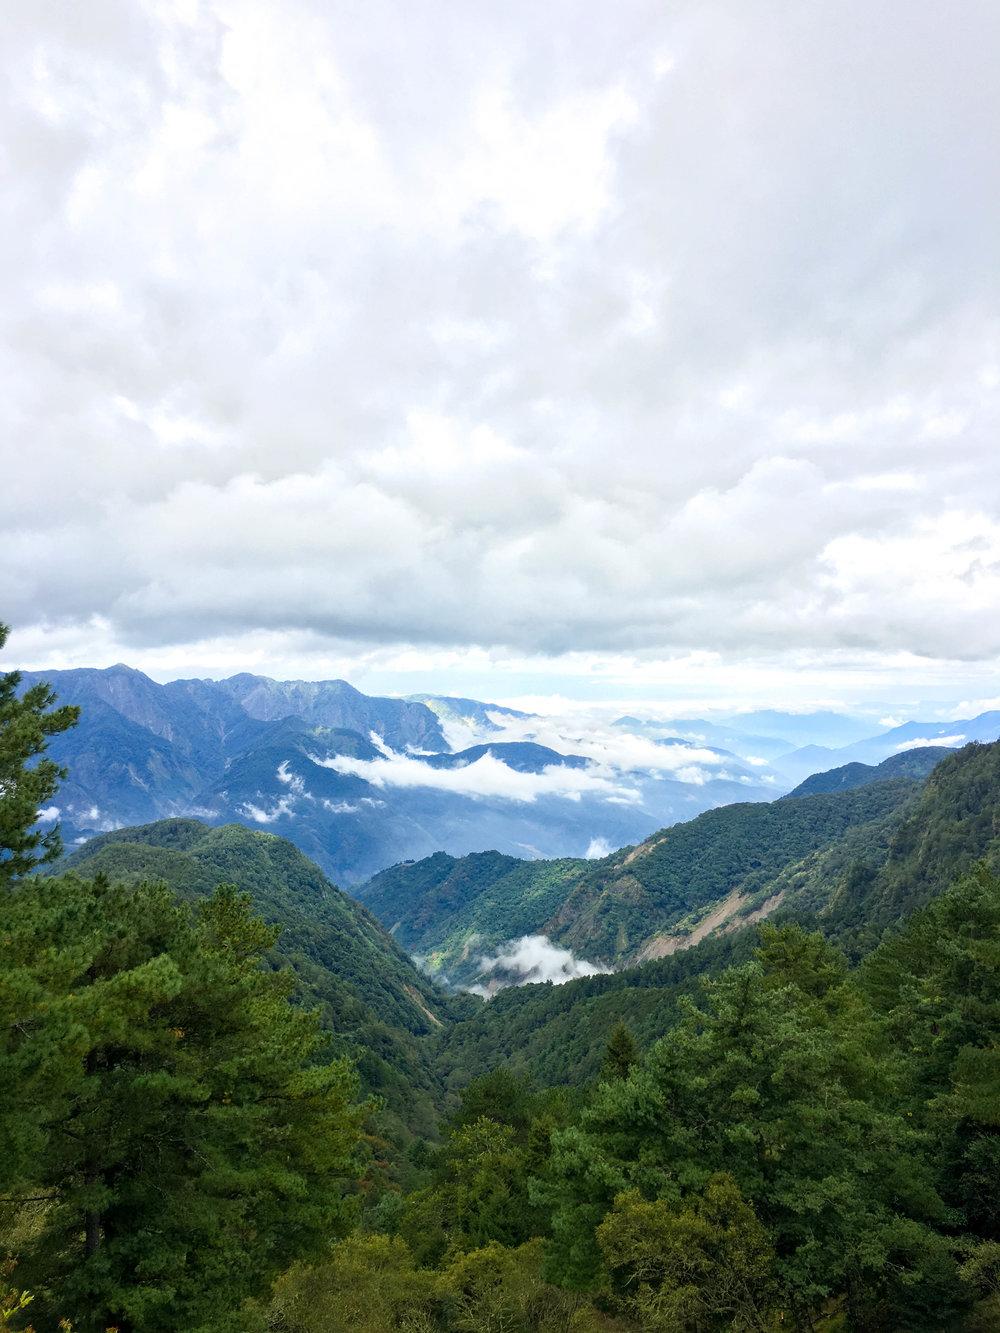 Mt. Alishan viewpoint